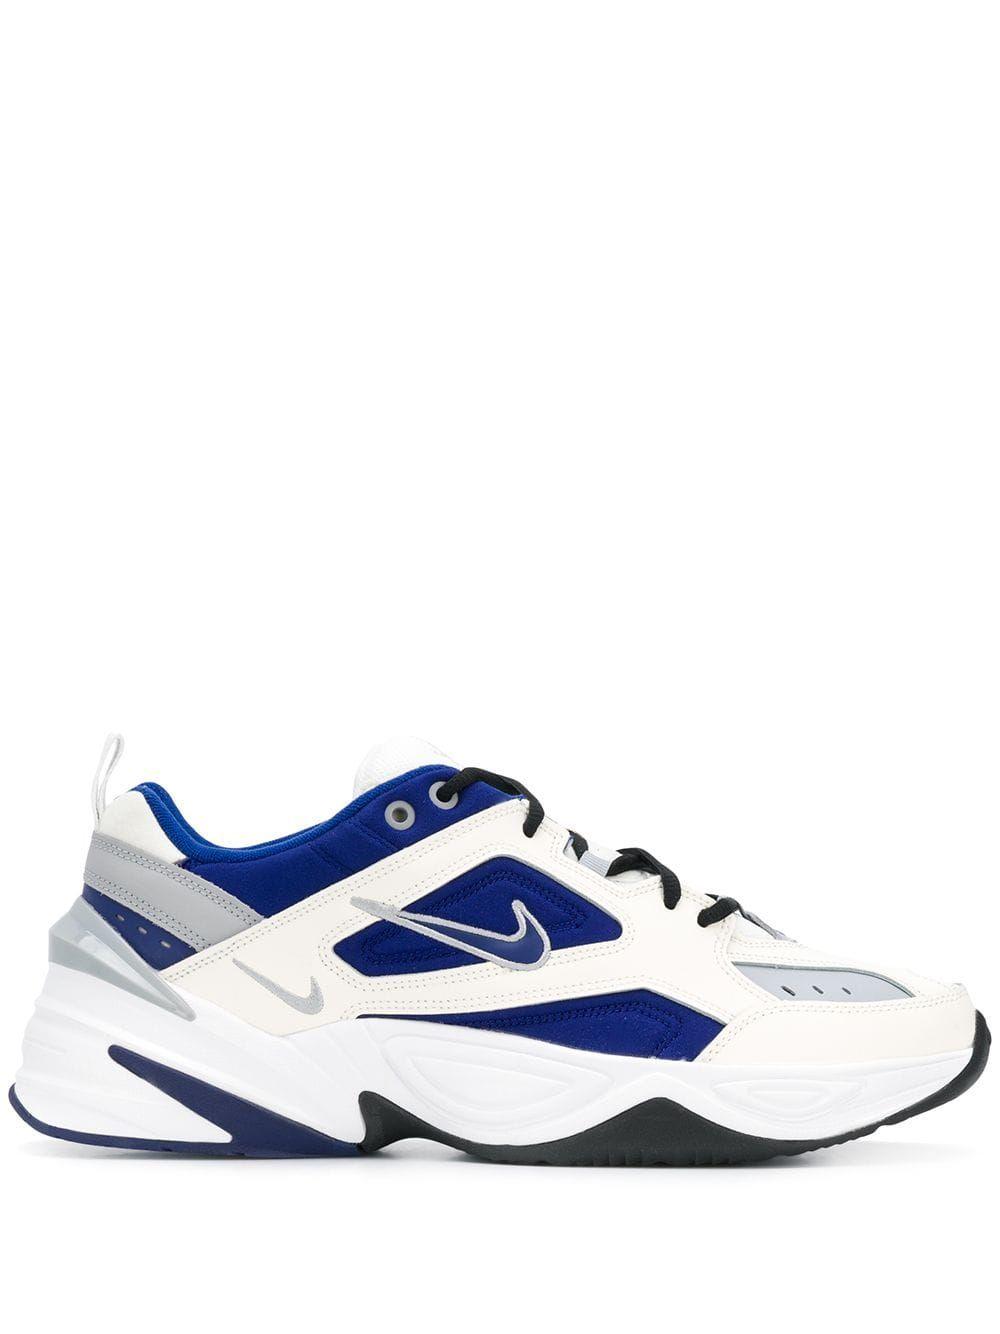 Nike M2K Tekno Sneakers in 2020 | Sneakers, Dad shoes